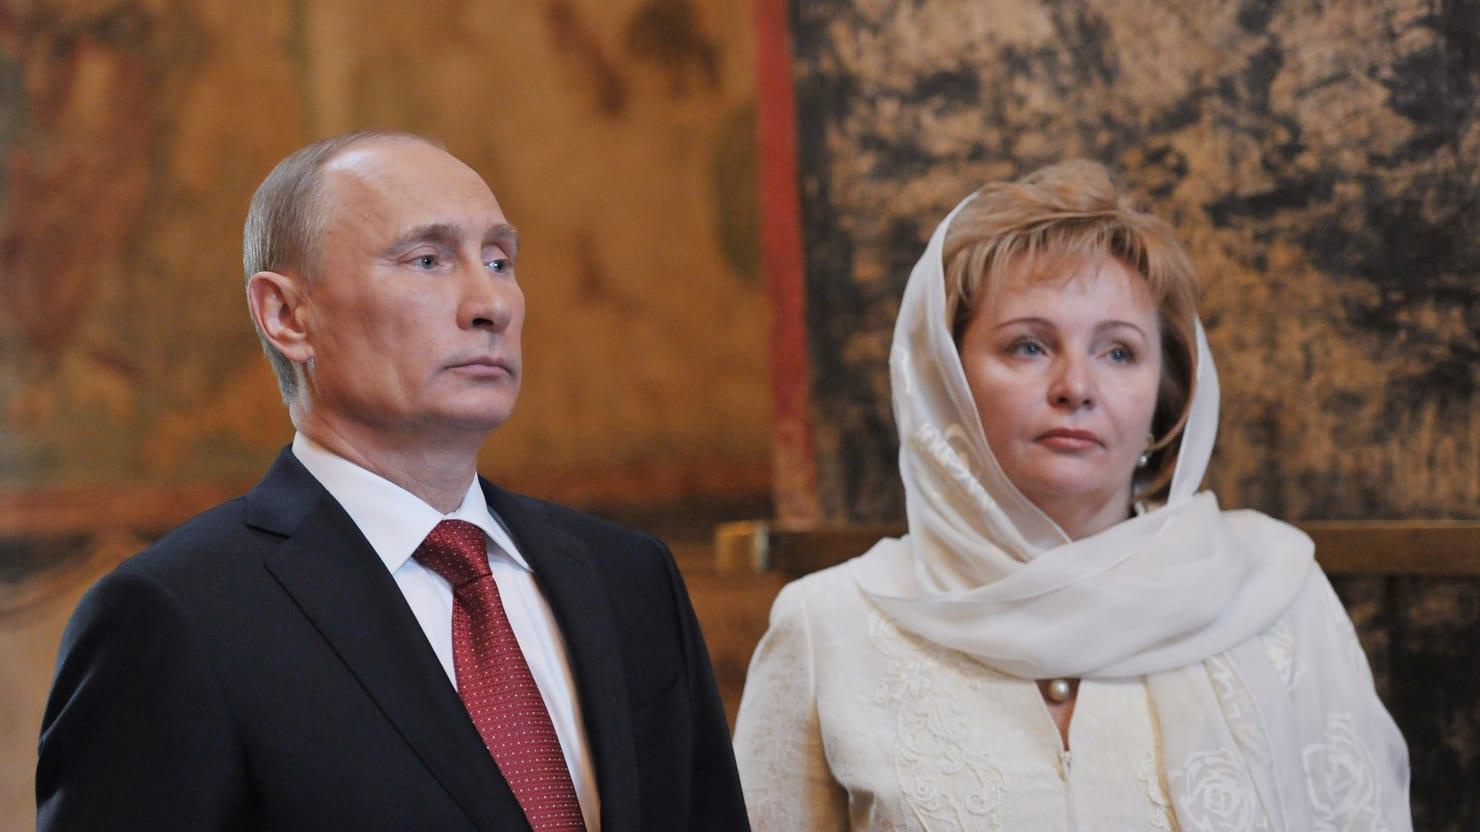 Bloggers called the photo of Svetlana Medvedeva a terrible fake January 28, 2012